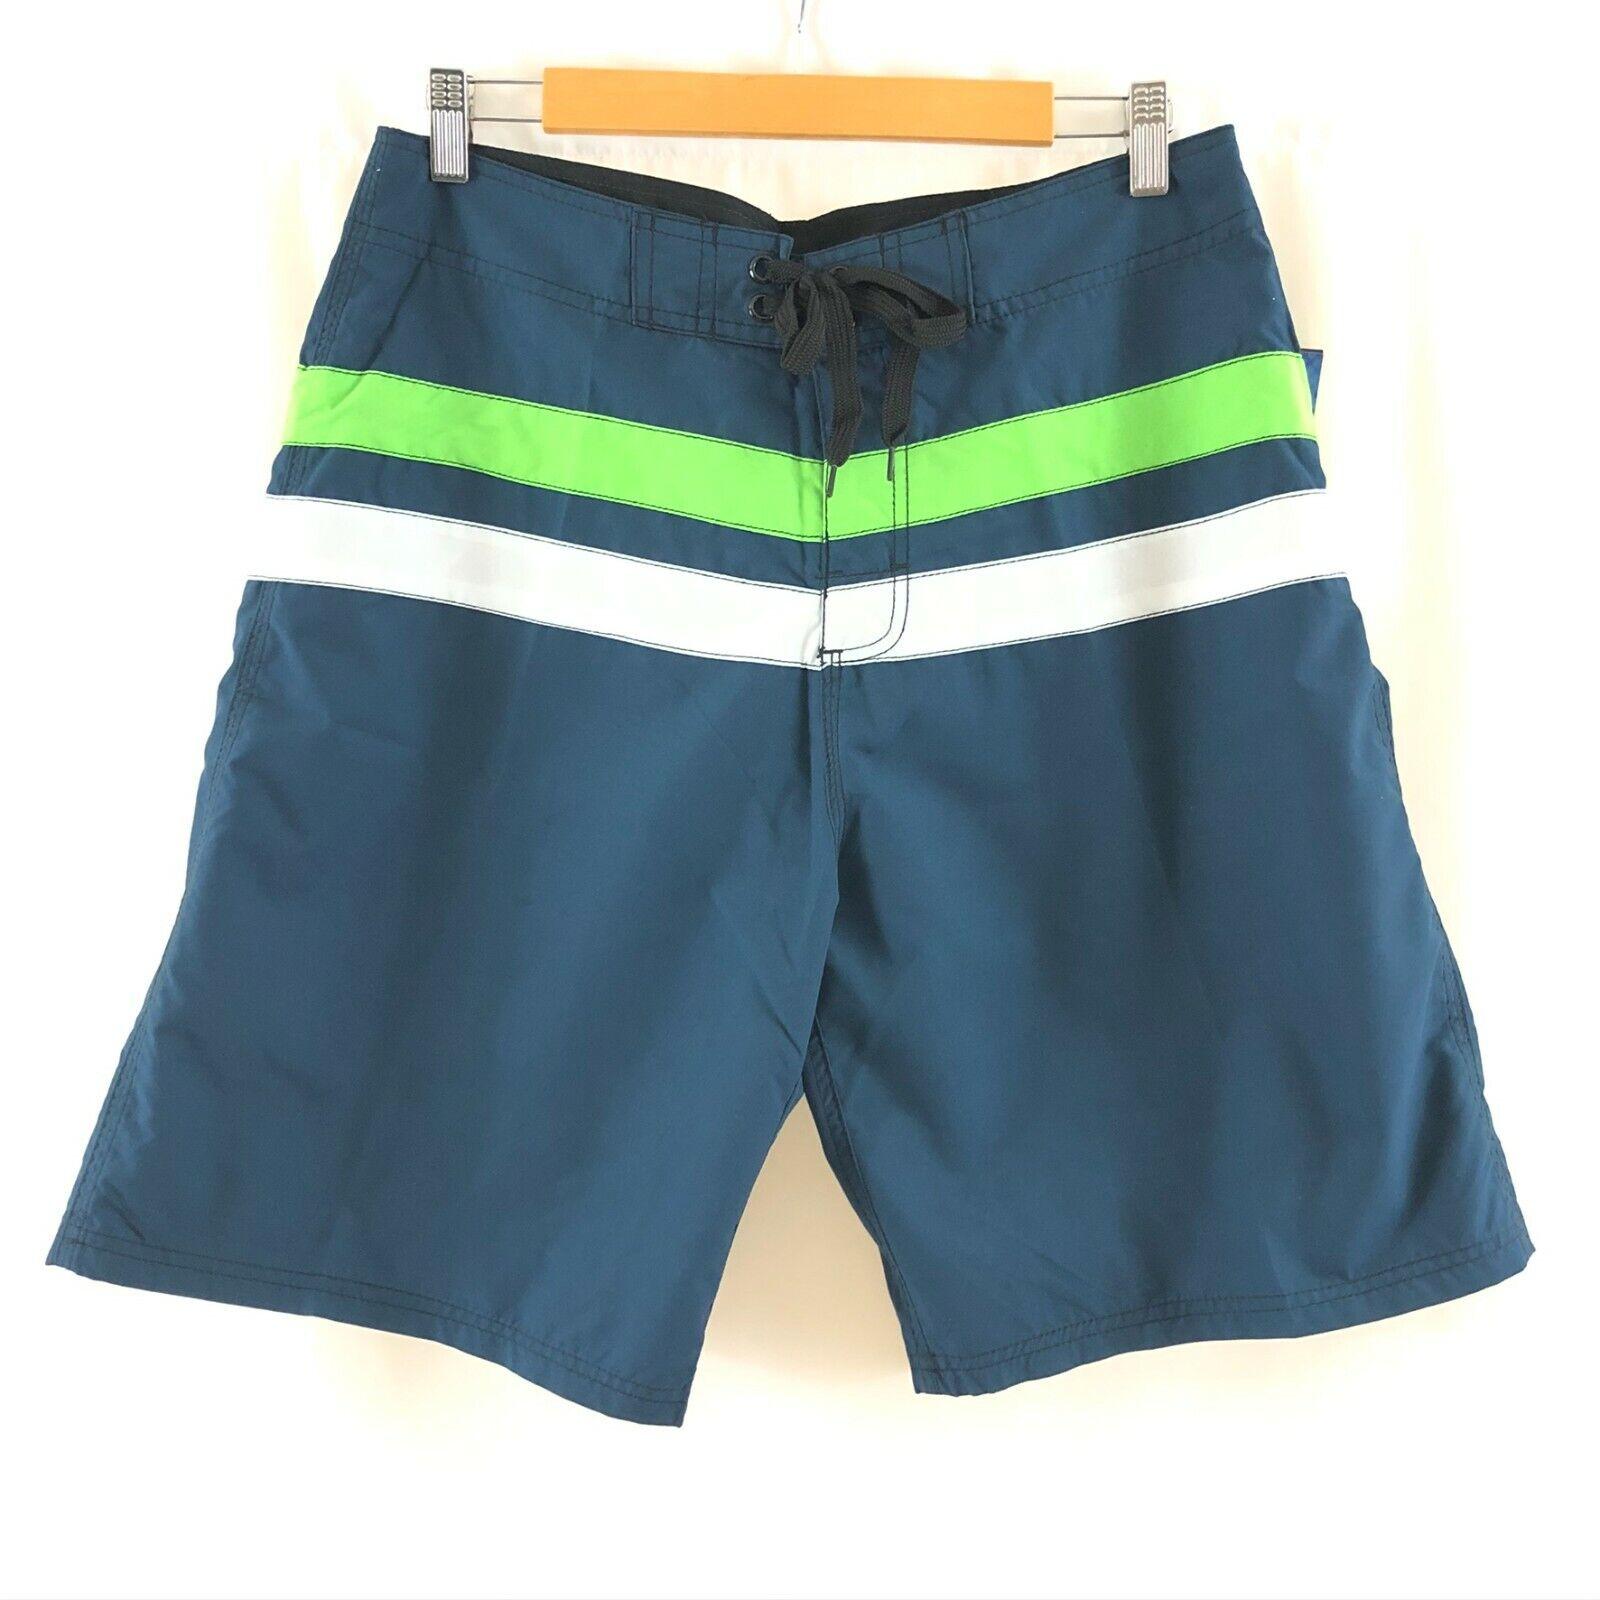 Kanu Surf Mens Board Shorts Striped Lace Up UPF 50+ Navy Blu